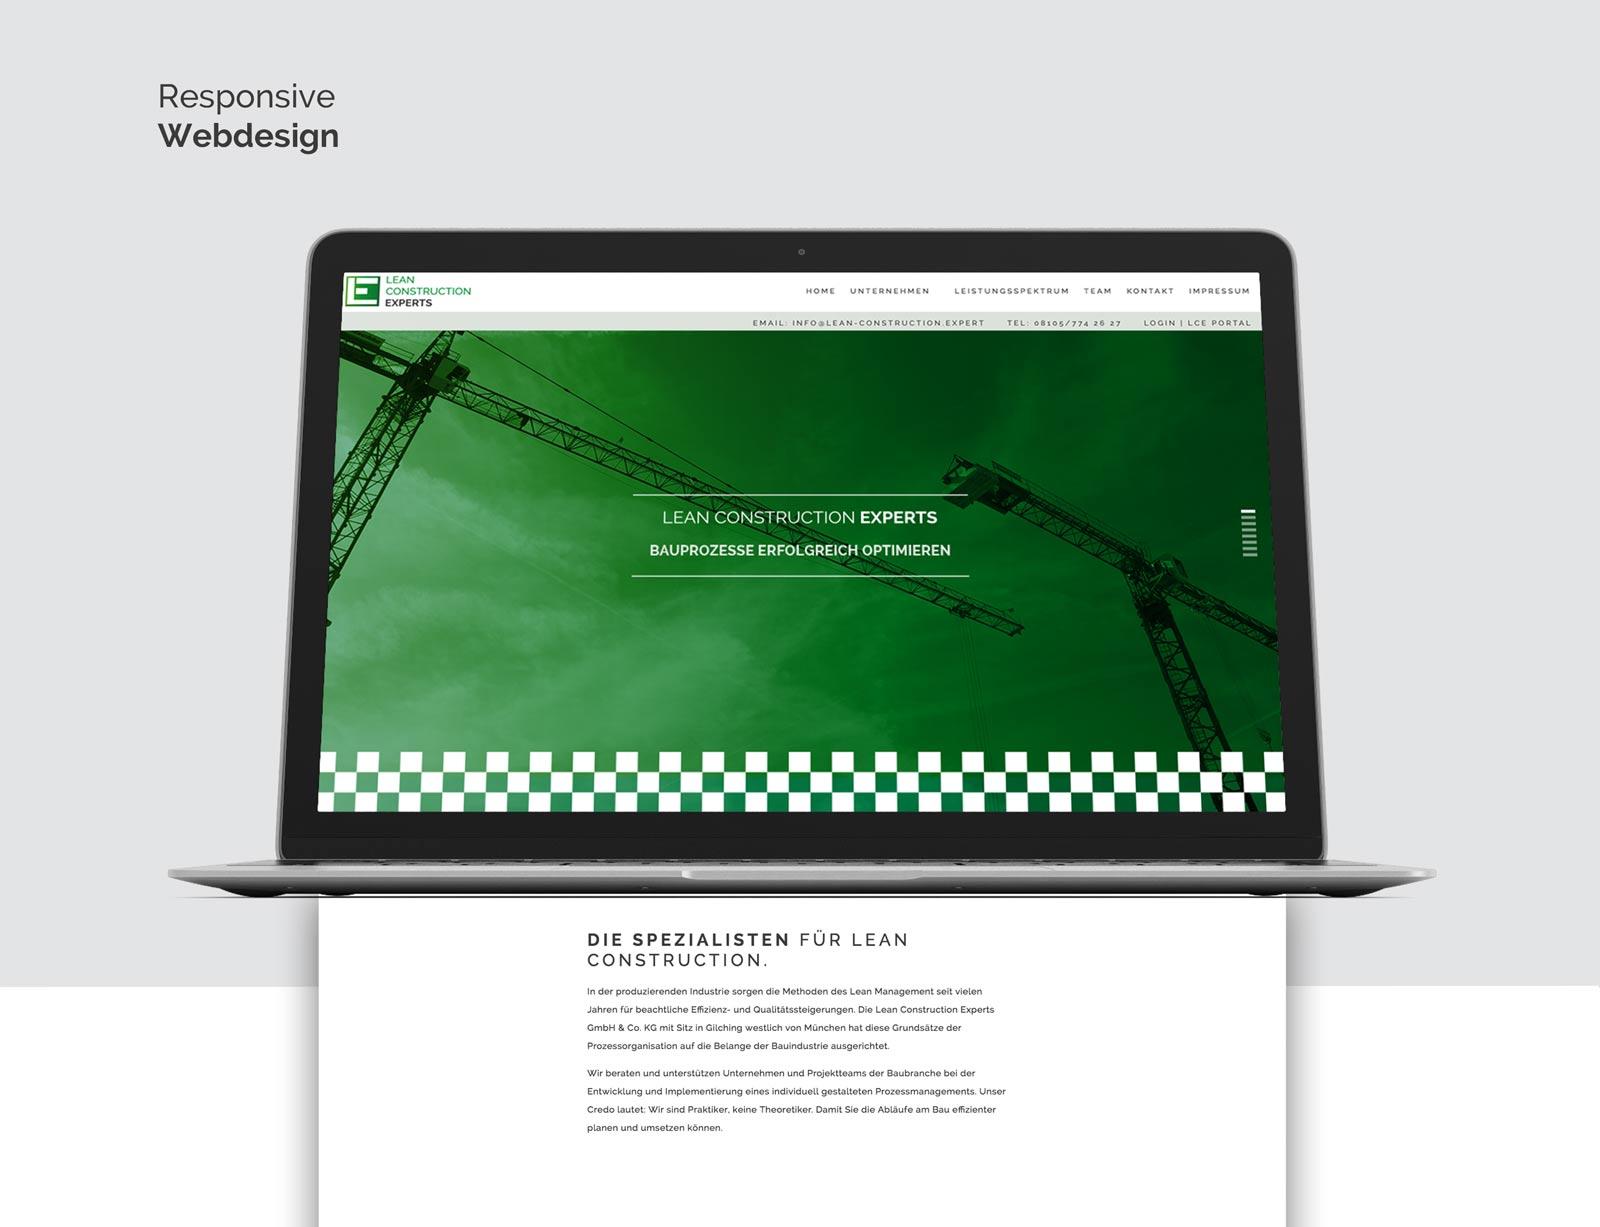 Lean_Construction_Experts_Webdesign_5.jpg